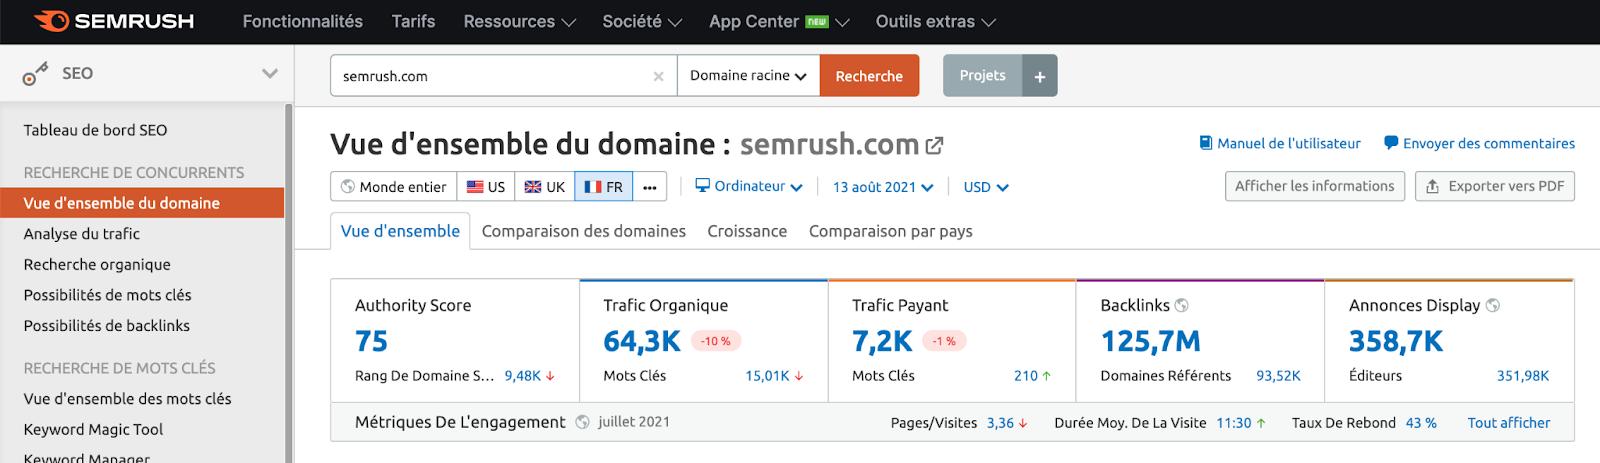 Semrush vue d'ensemble du domaine (semrush.com)